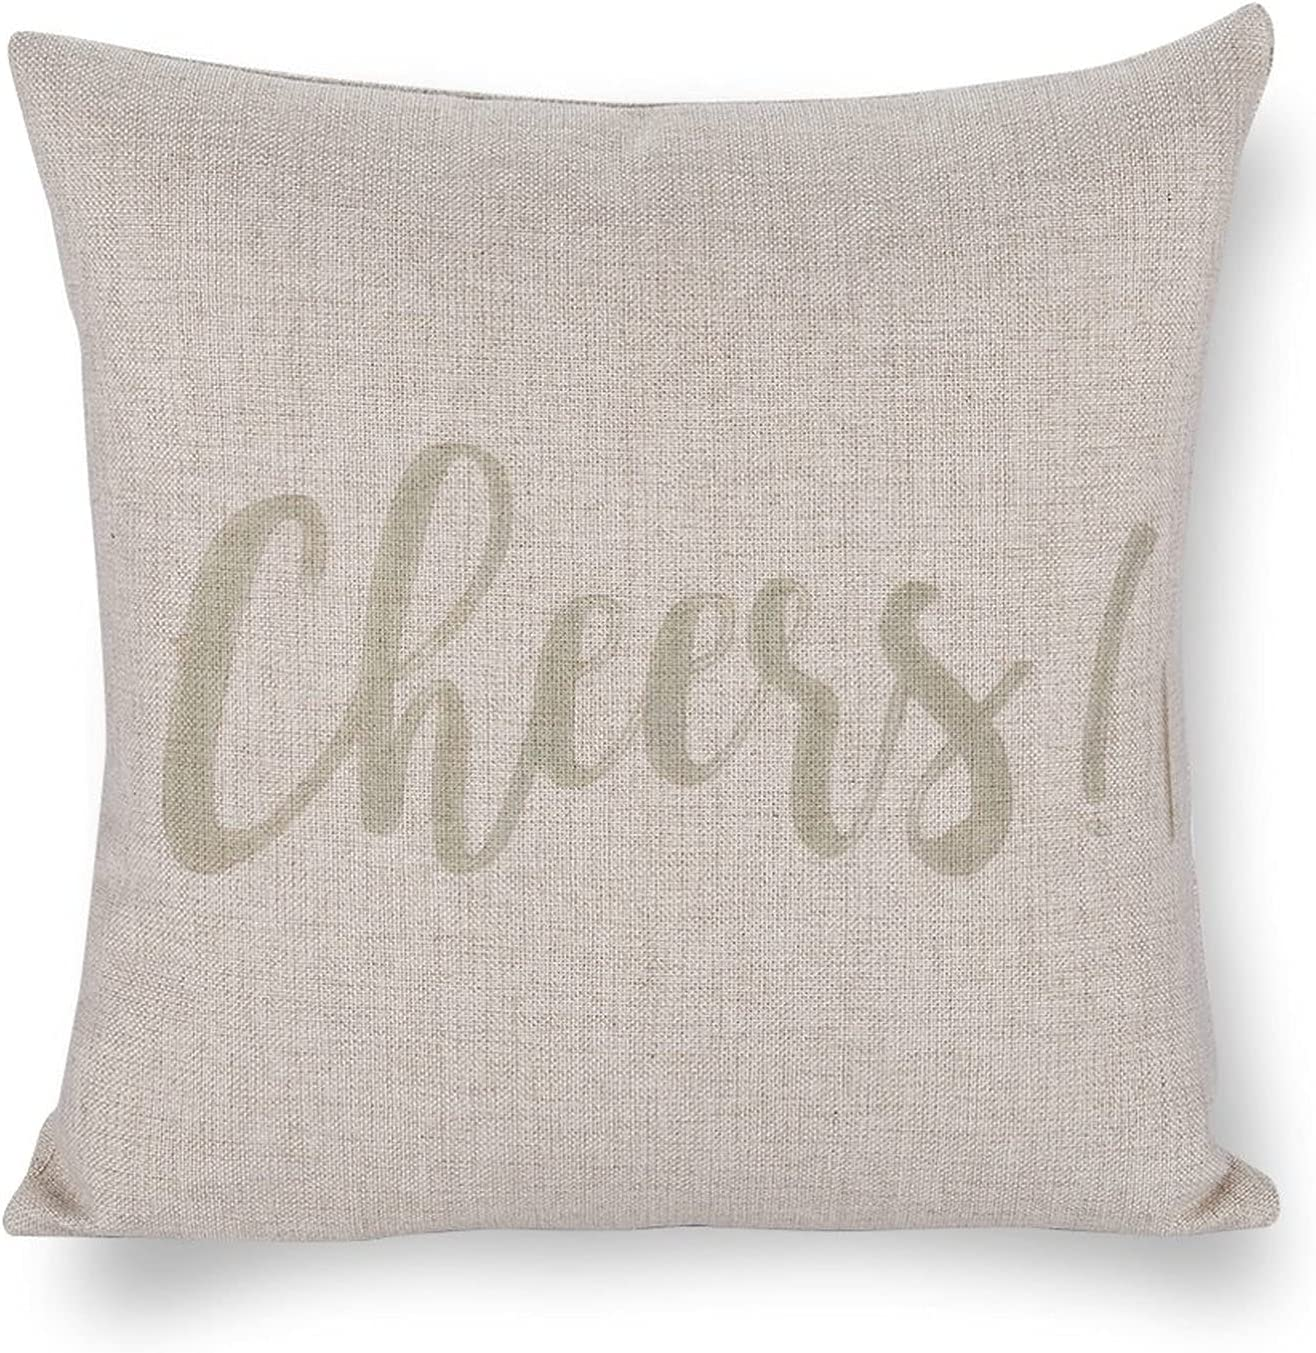 UTF4C Cheers Cotton Linen Sofa Cushion NEW Art Home Design Max 58% OFF Bed Decor